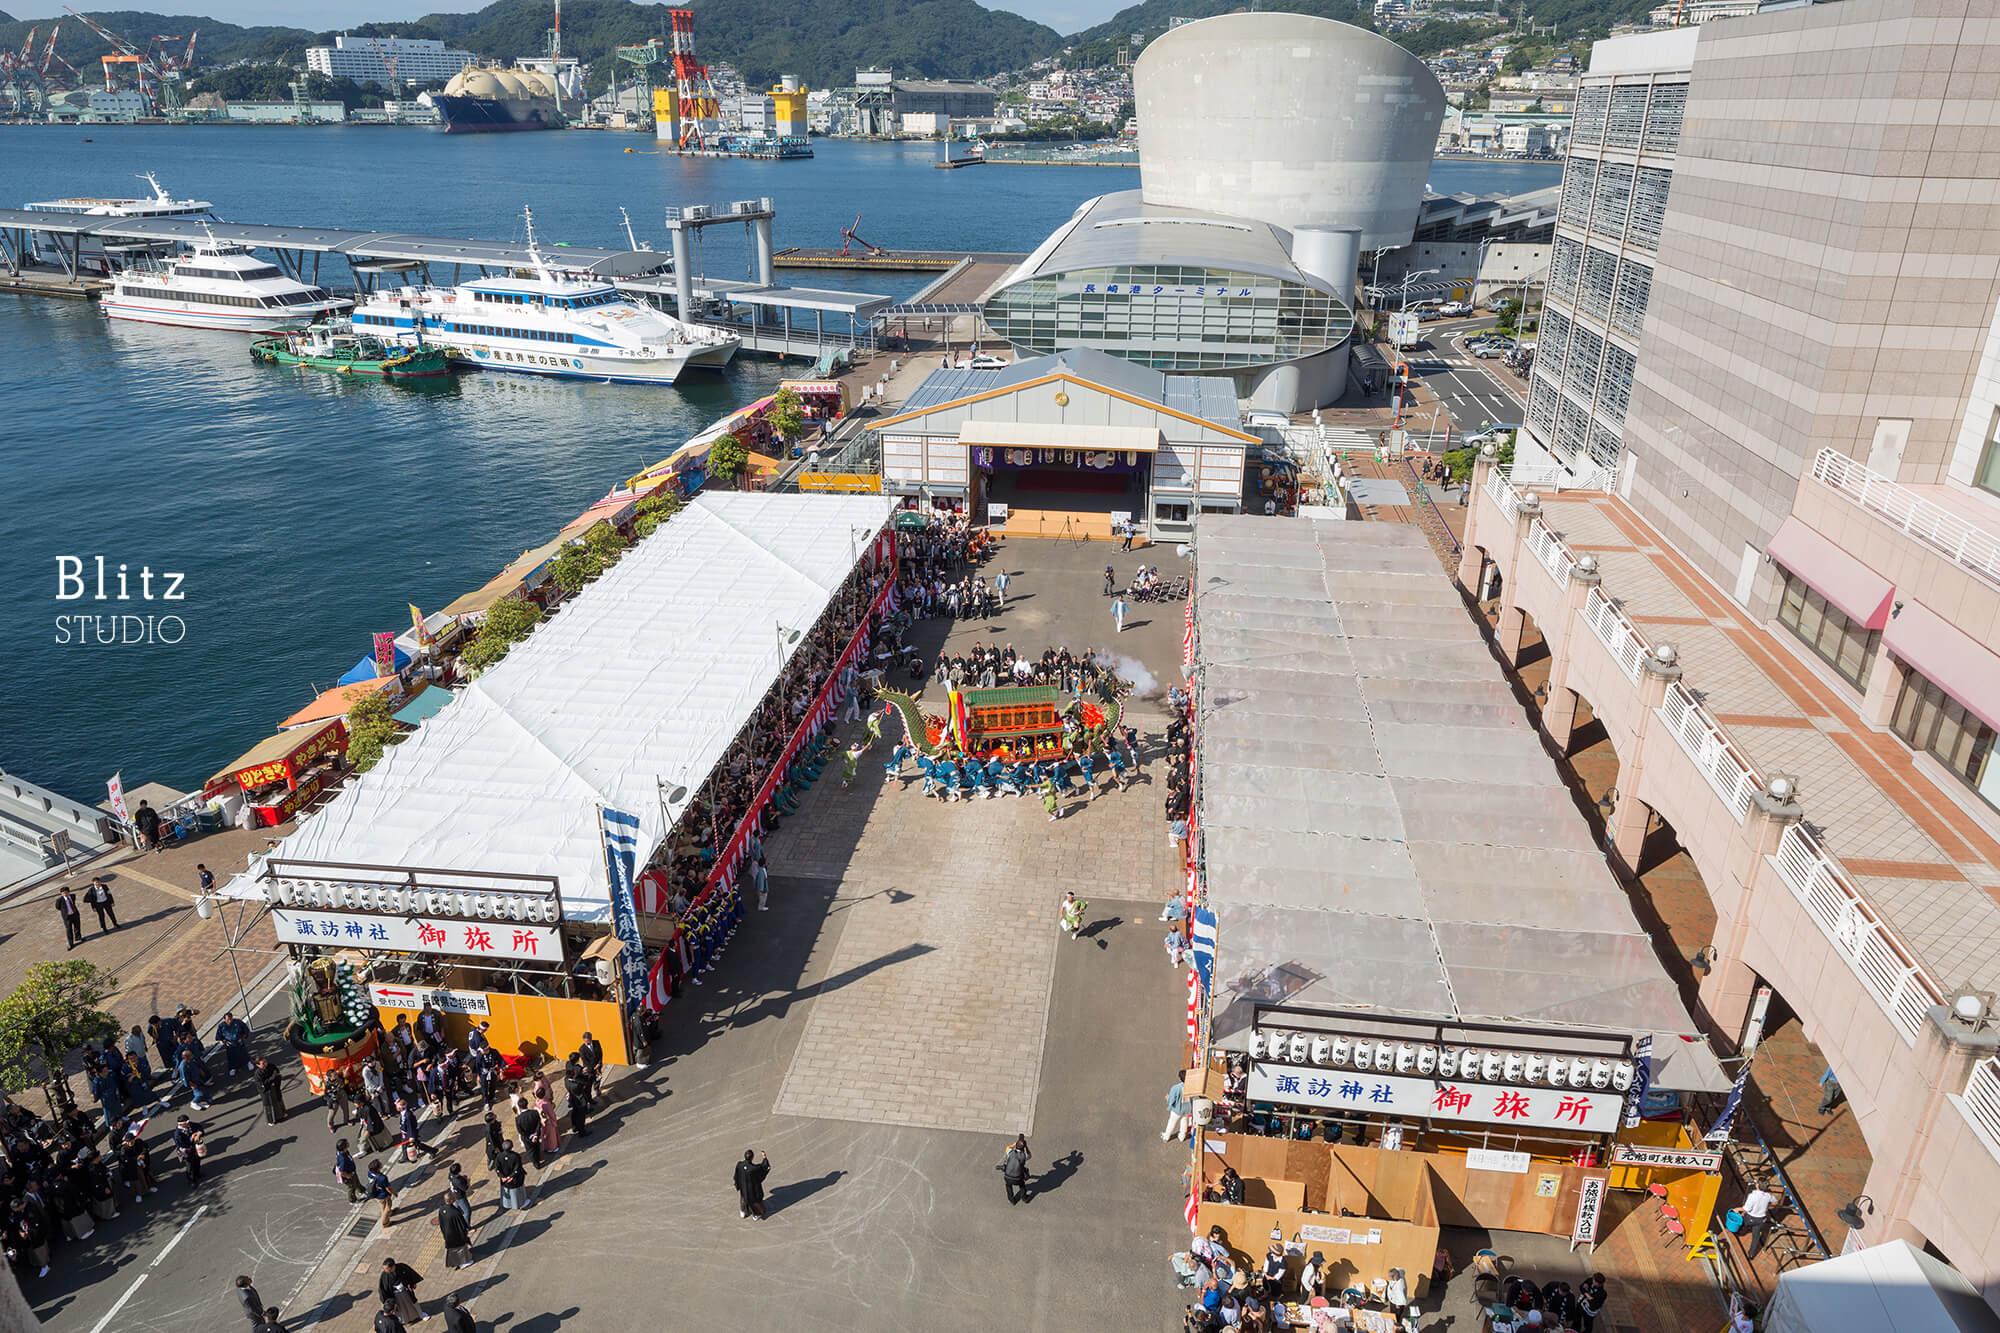 『諏訪神社 お旅所』-長崎県長崎市-建築写真・竣工写真・インテリア写真1